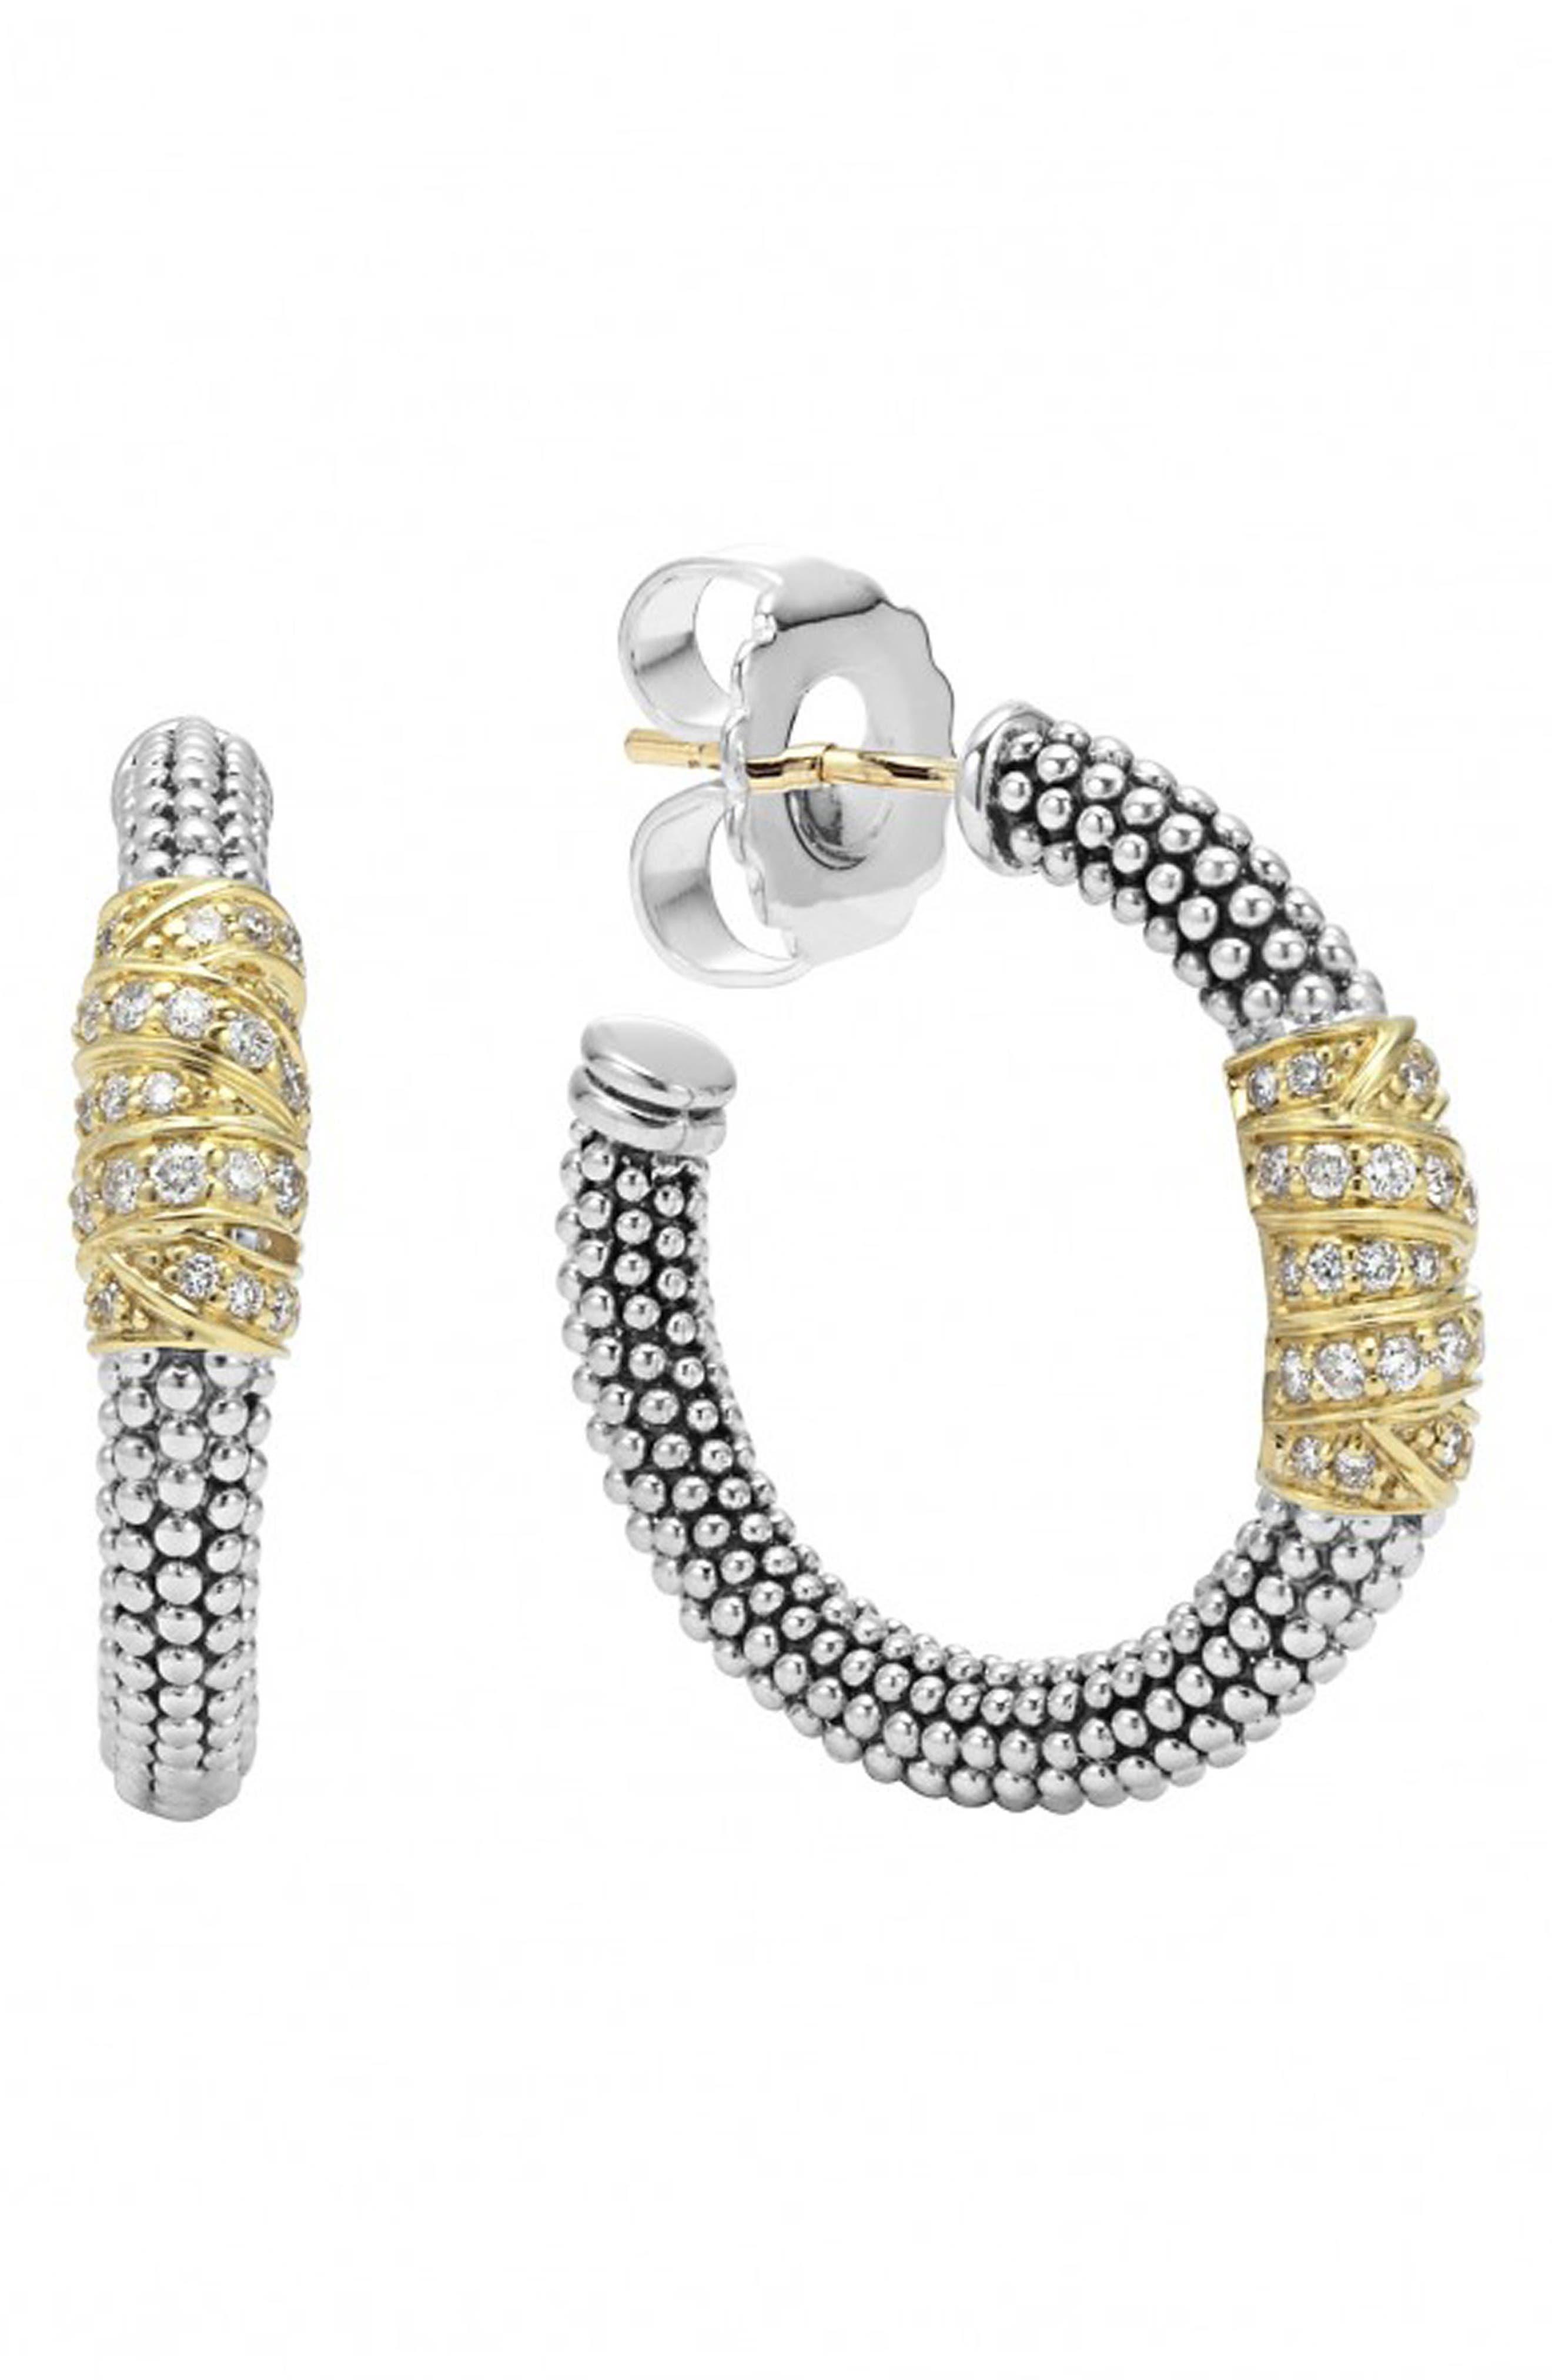 'Embrace' Caviar Diamond Hoop Earrings,                             Alternate thumbnail 4, color,                             STERLING SILVER/ GOLD